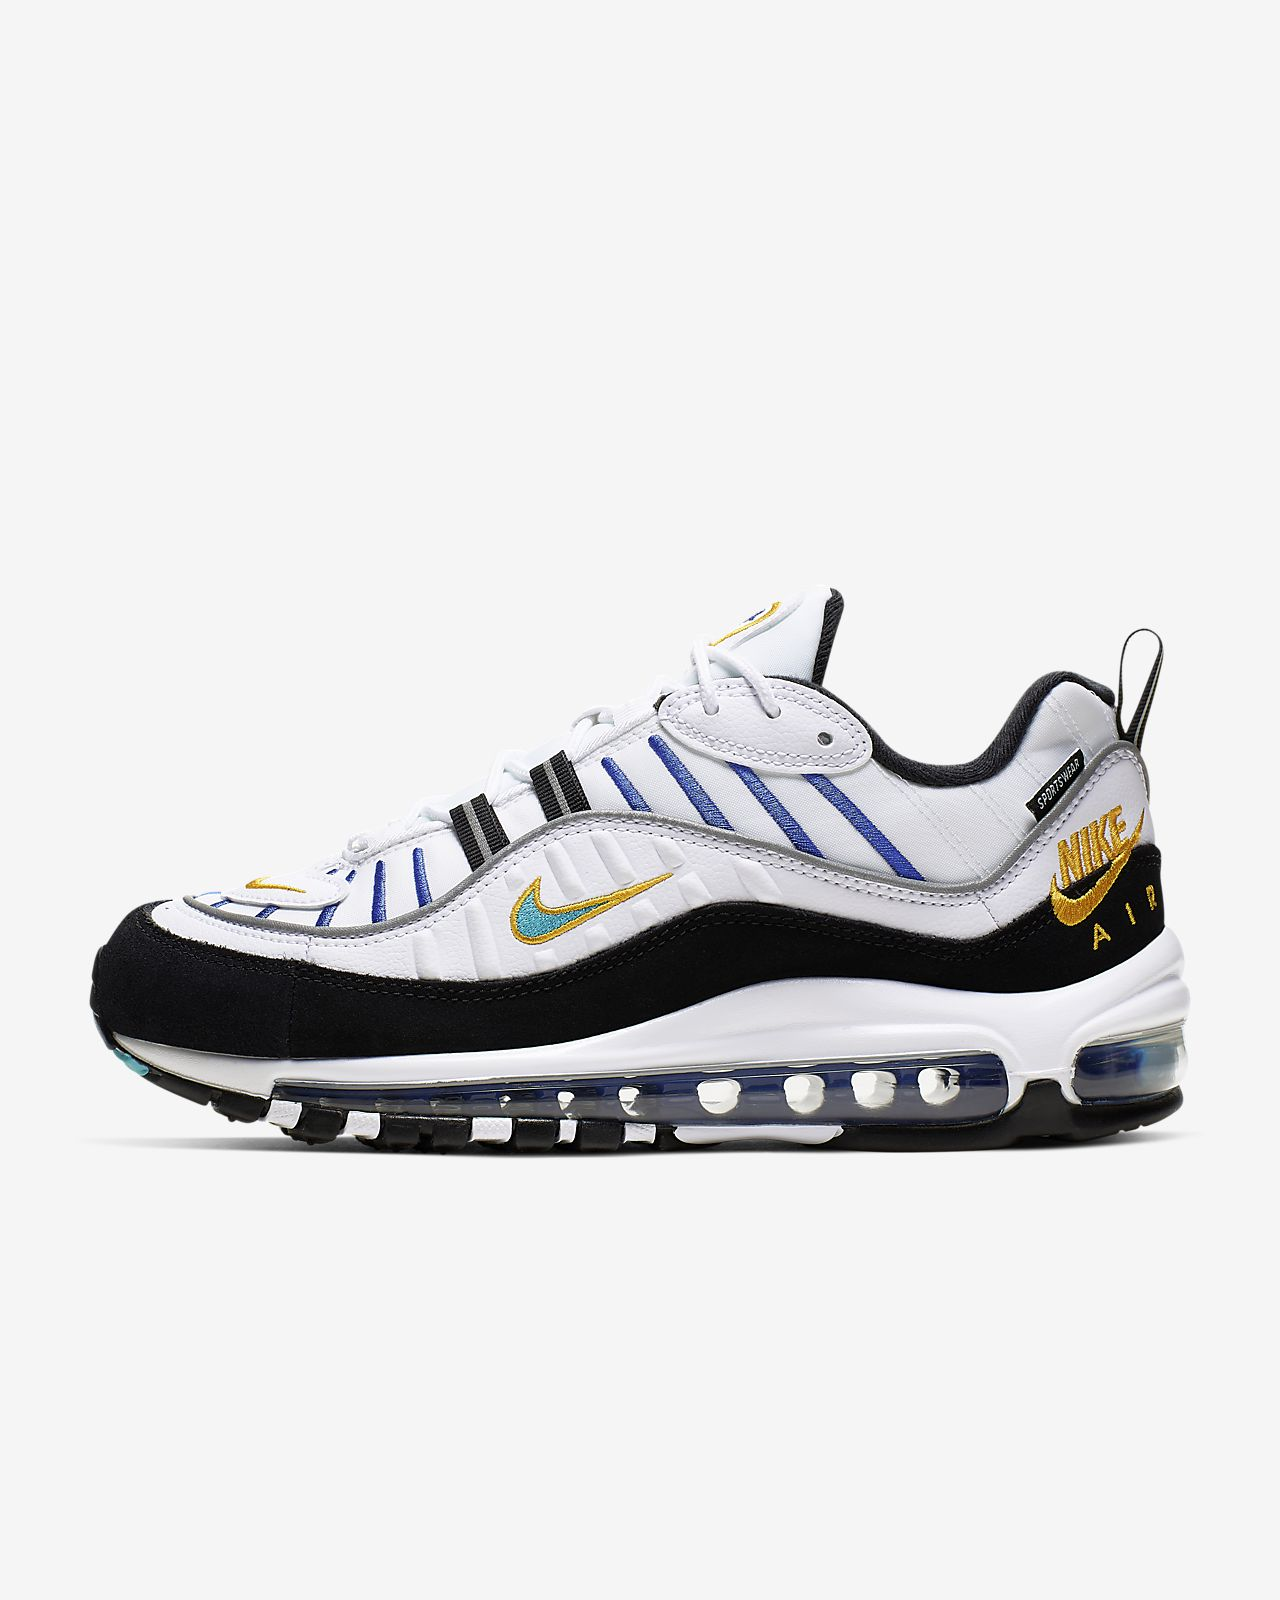 Dámská bota Nike Air Max 98 Premium